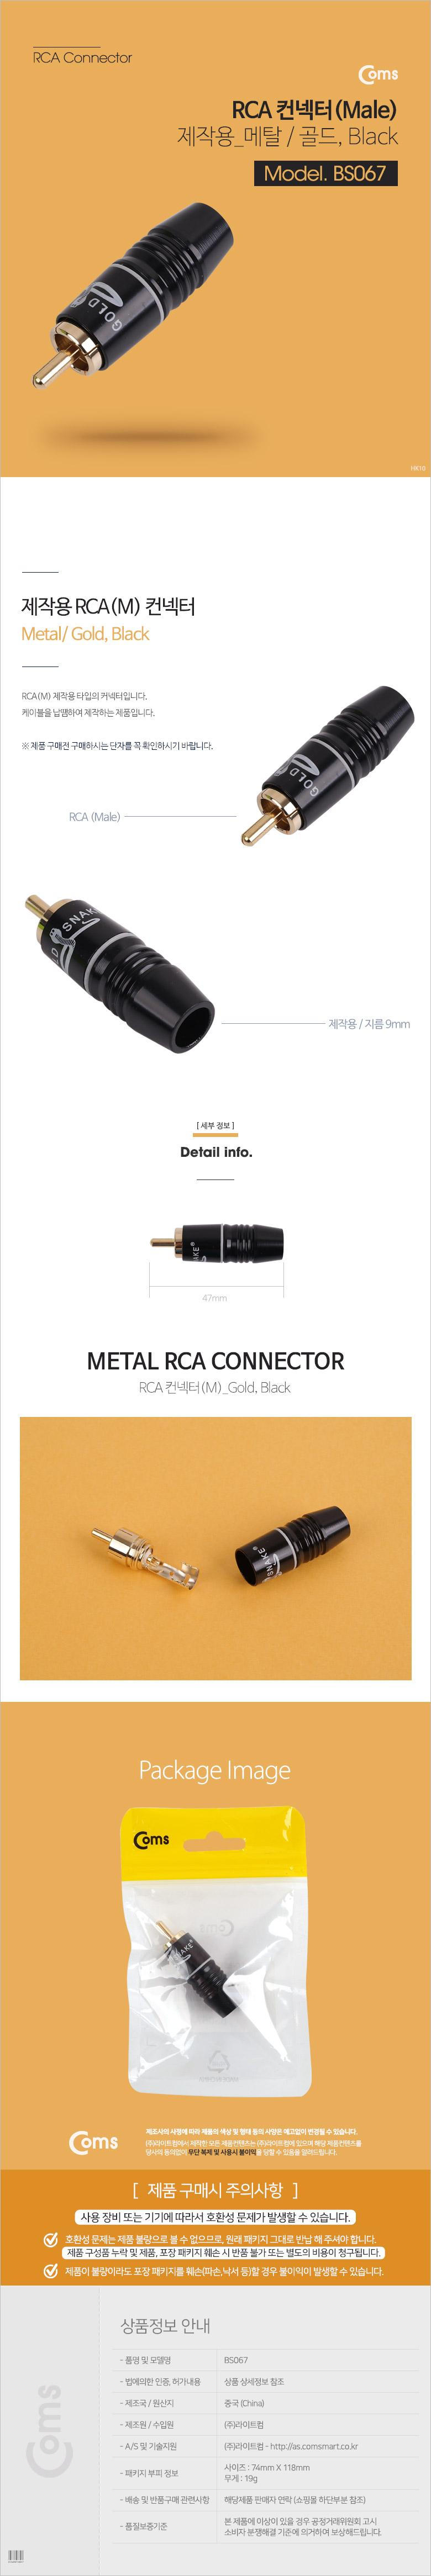 BS067 Coms 컨넥터-RCA 수 메탈 골드. Black